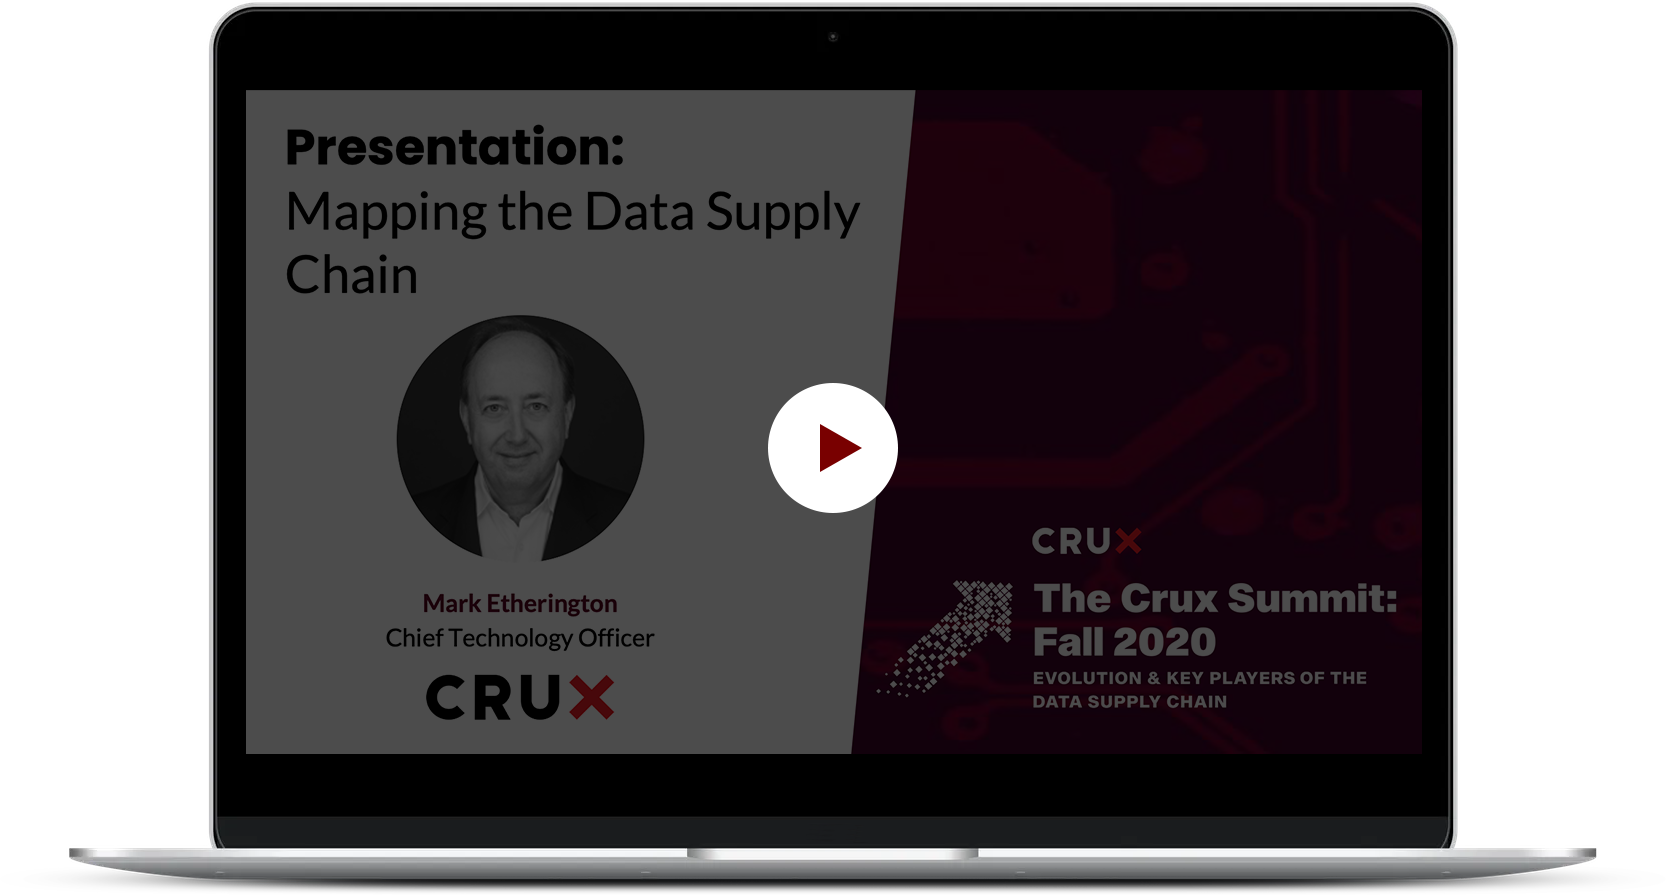 Crux_TCS_Mappingthedatasupplychain_01